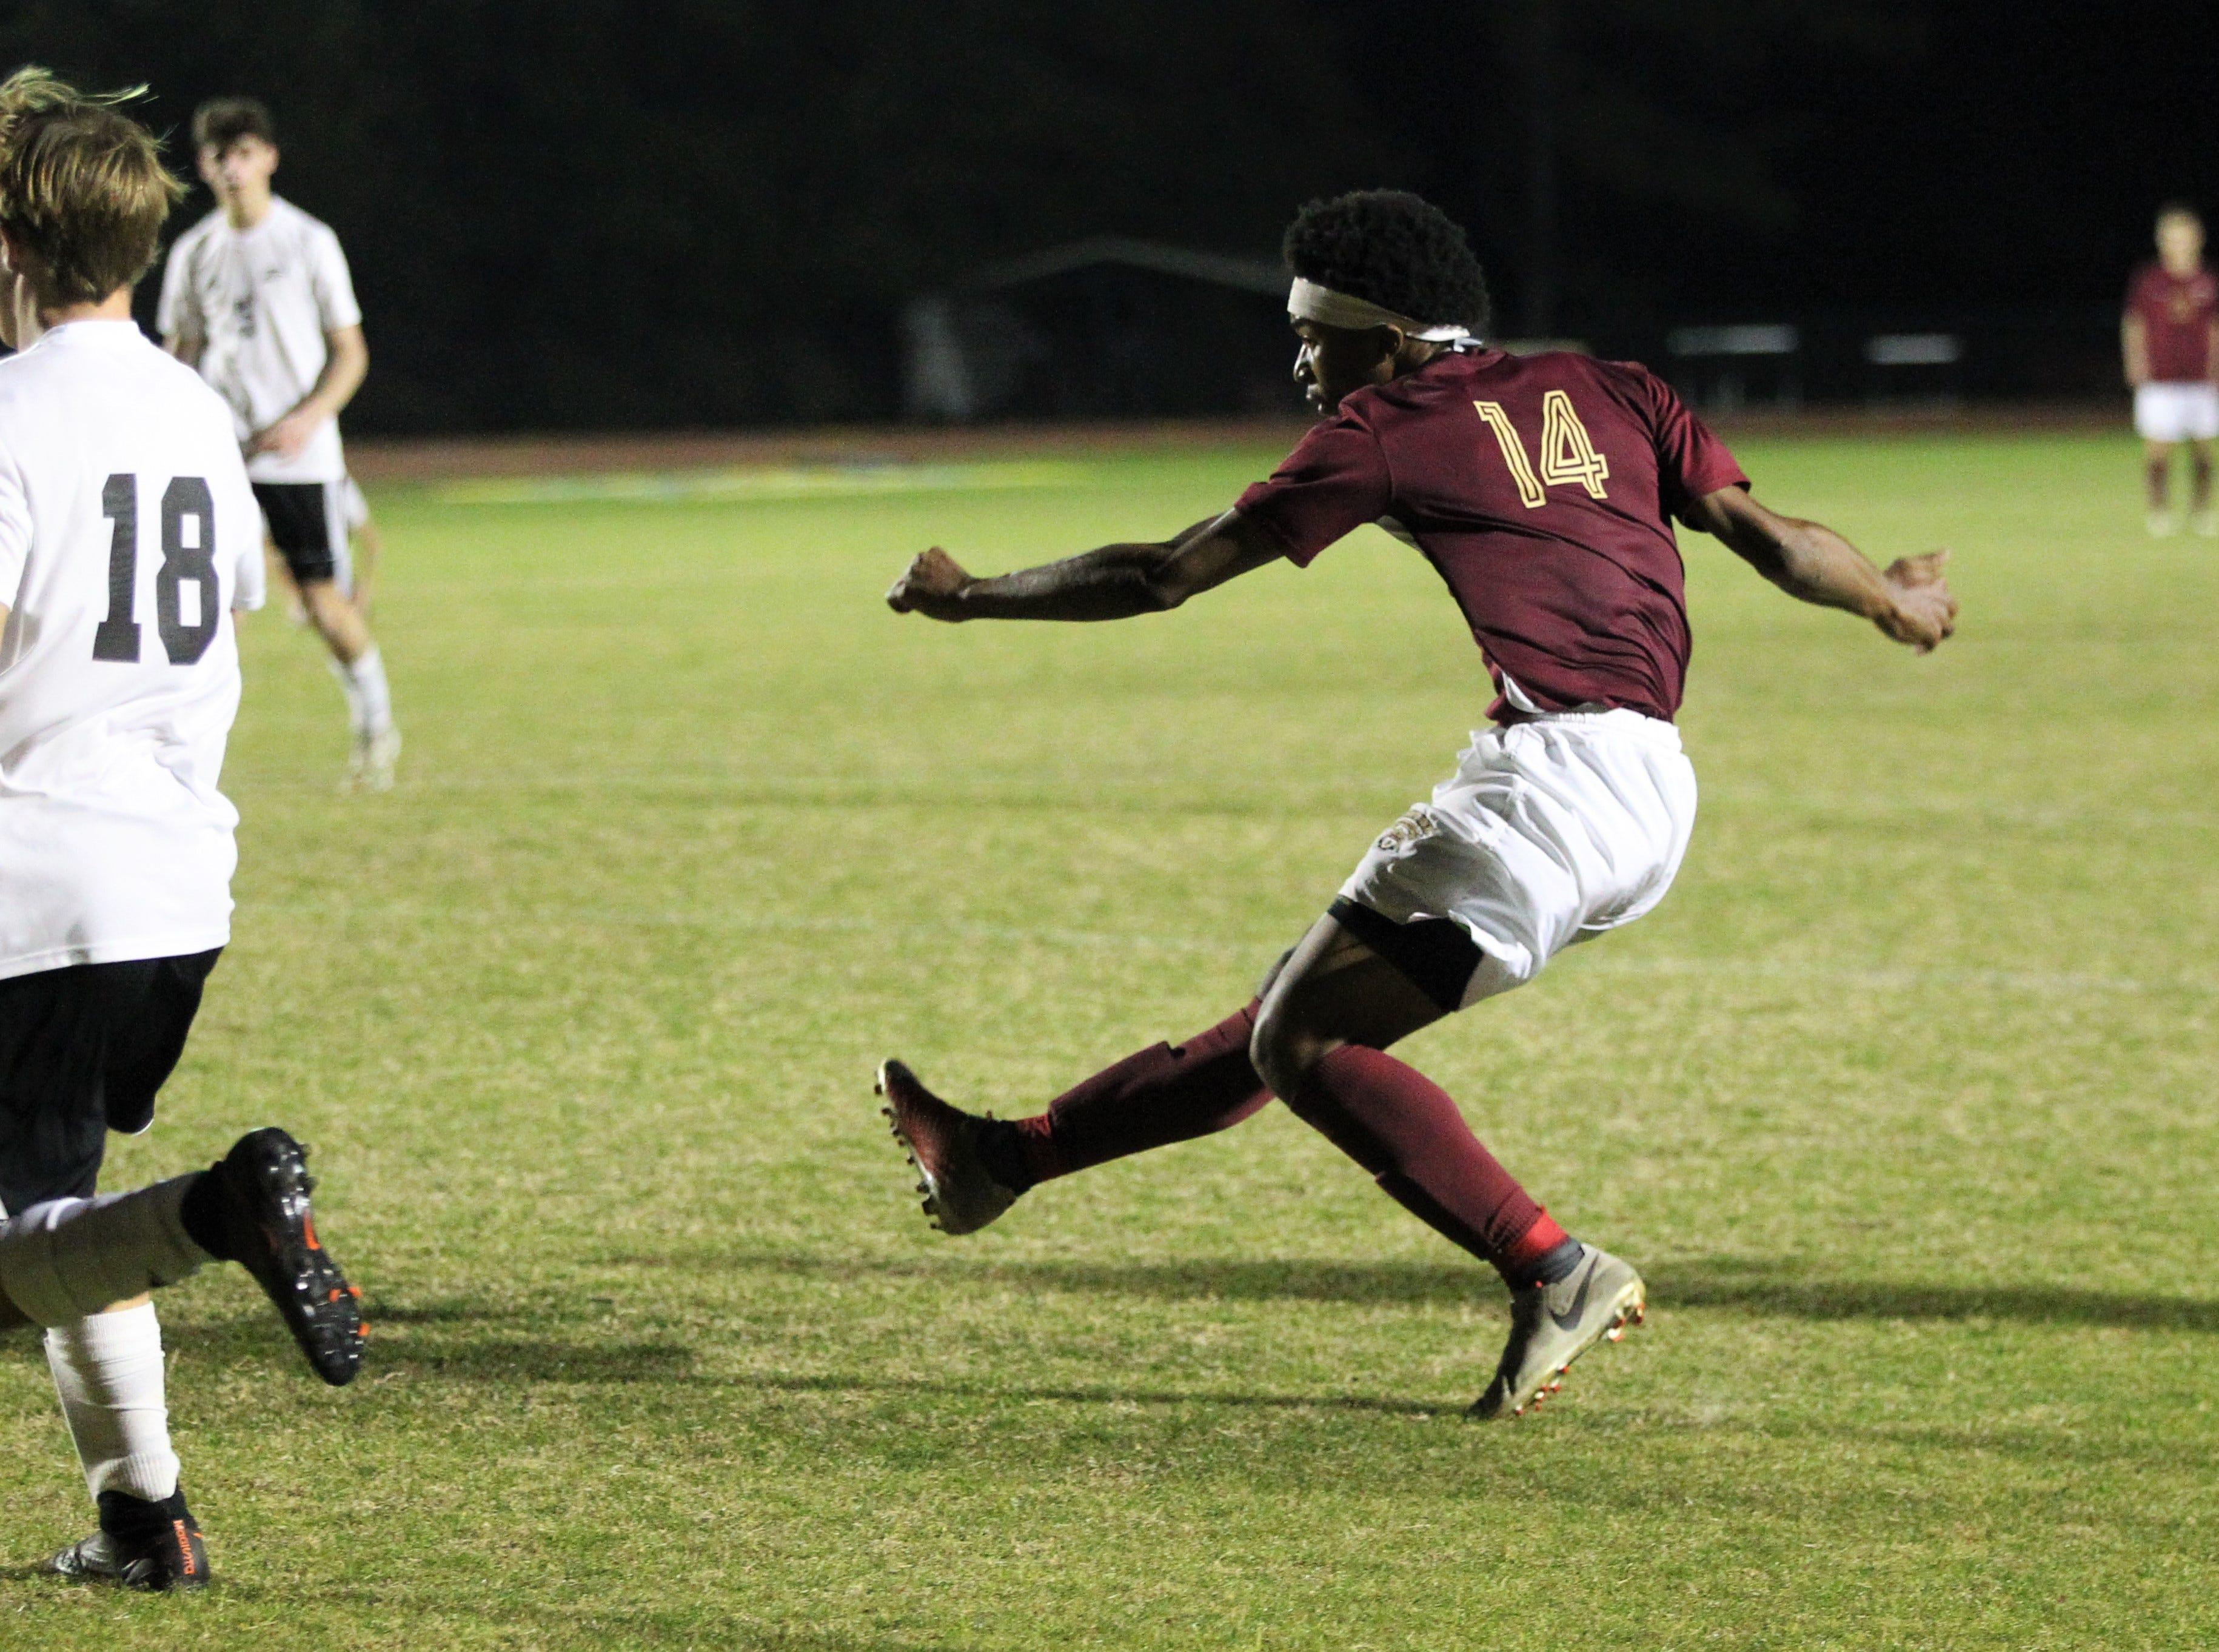 Florida High's Burnic Jordan takes a shot that sails over goal as Florida High's boys soccer team beat South Walton 2-0 during a Region 1-2A quarterfinal on Feb. 6, 2018.